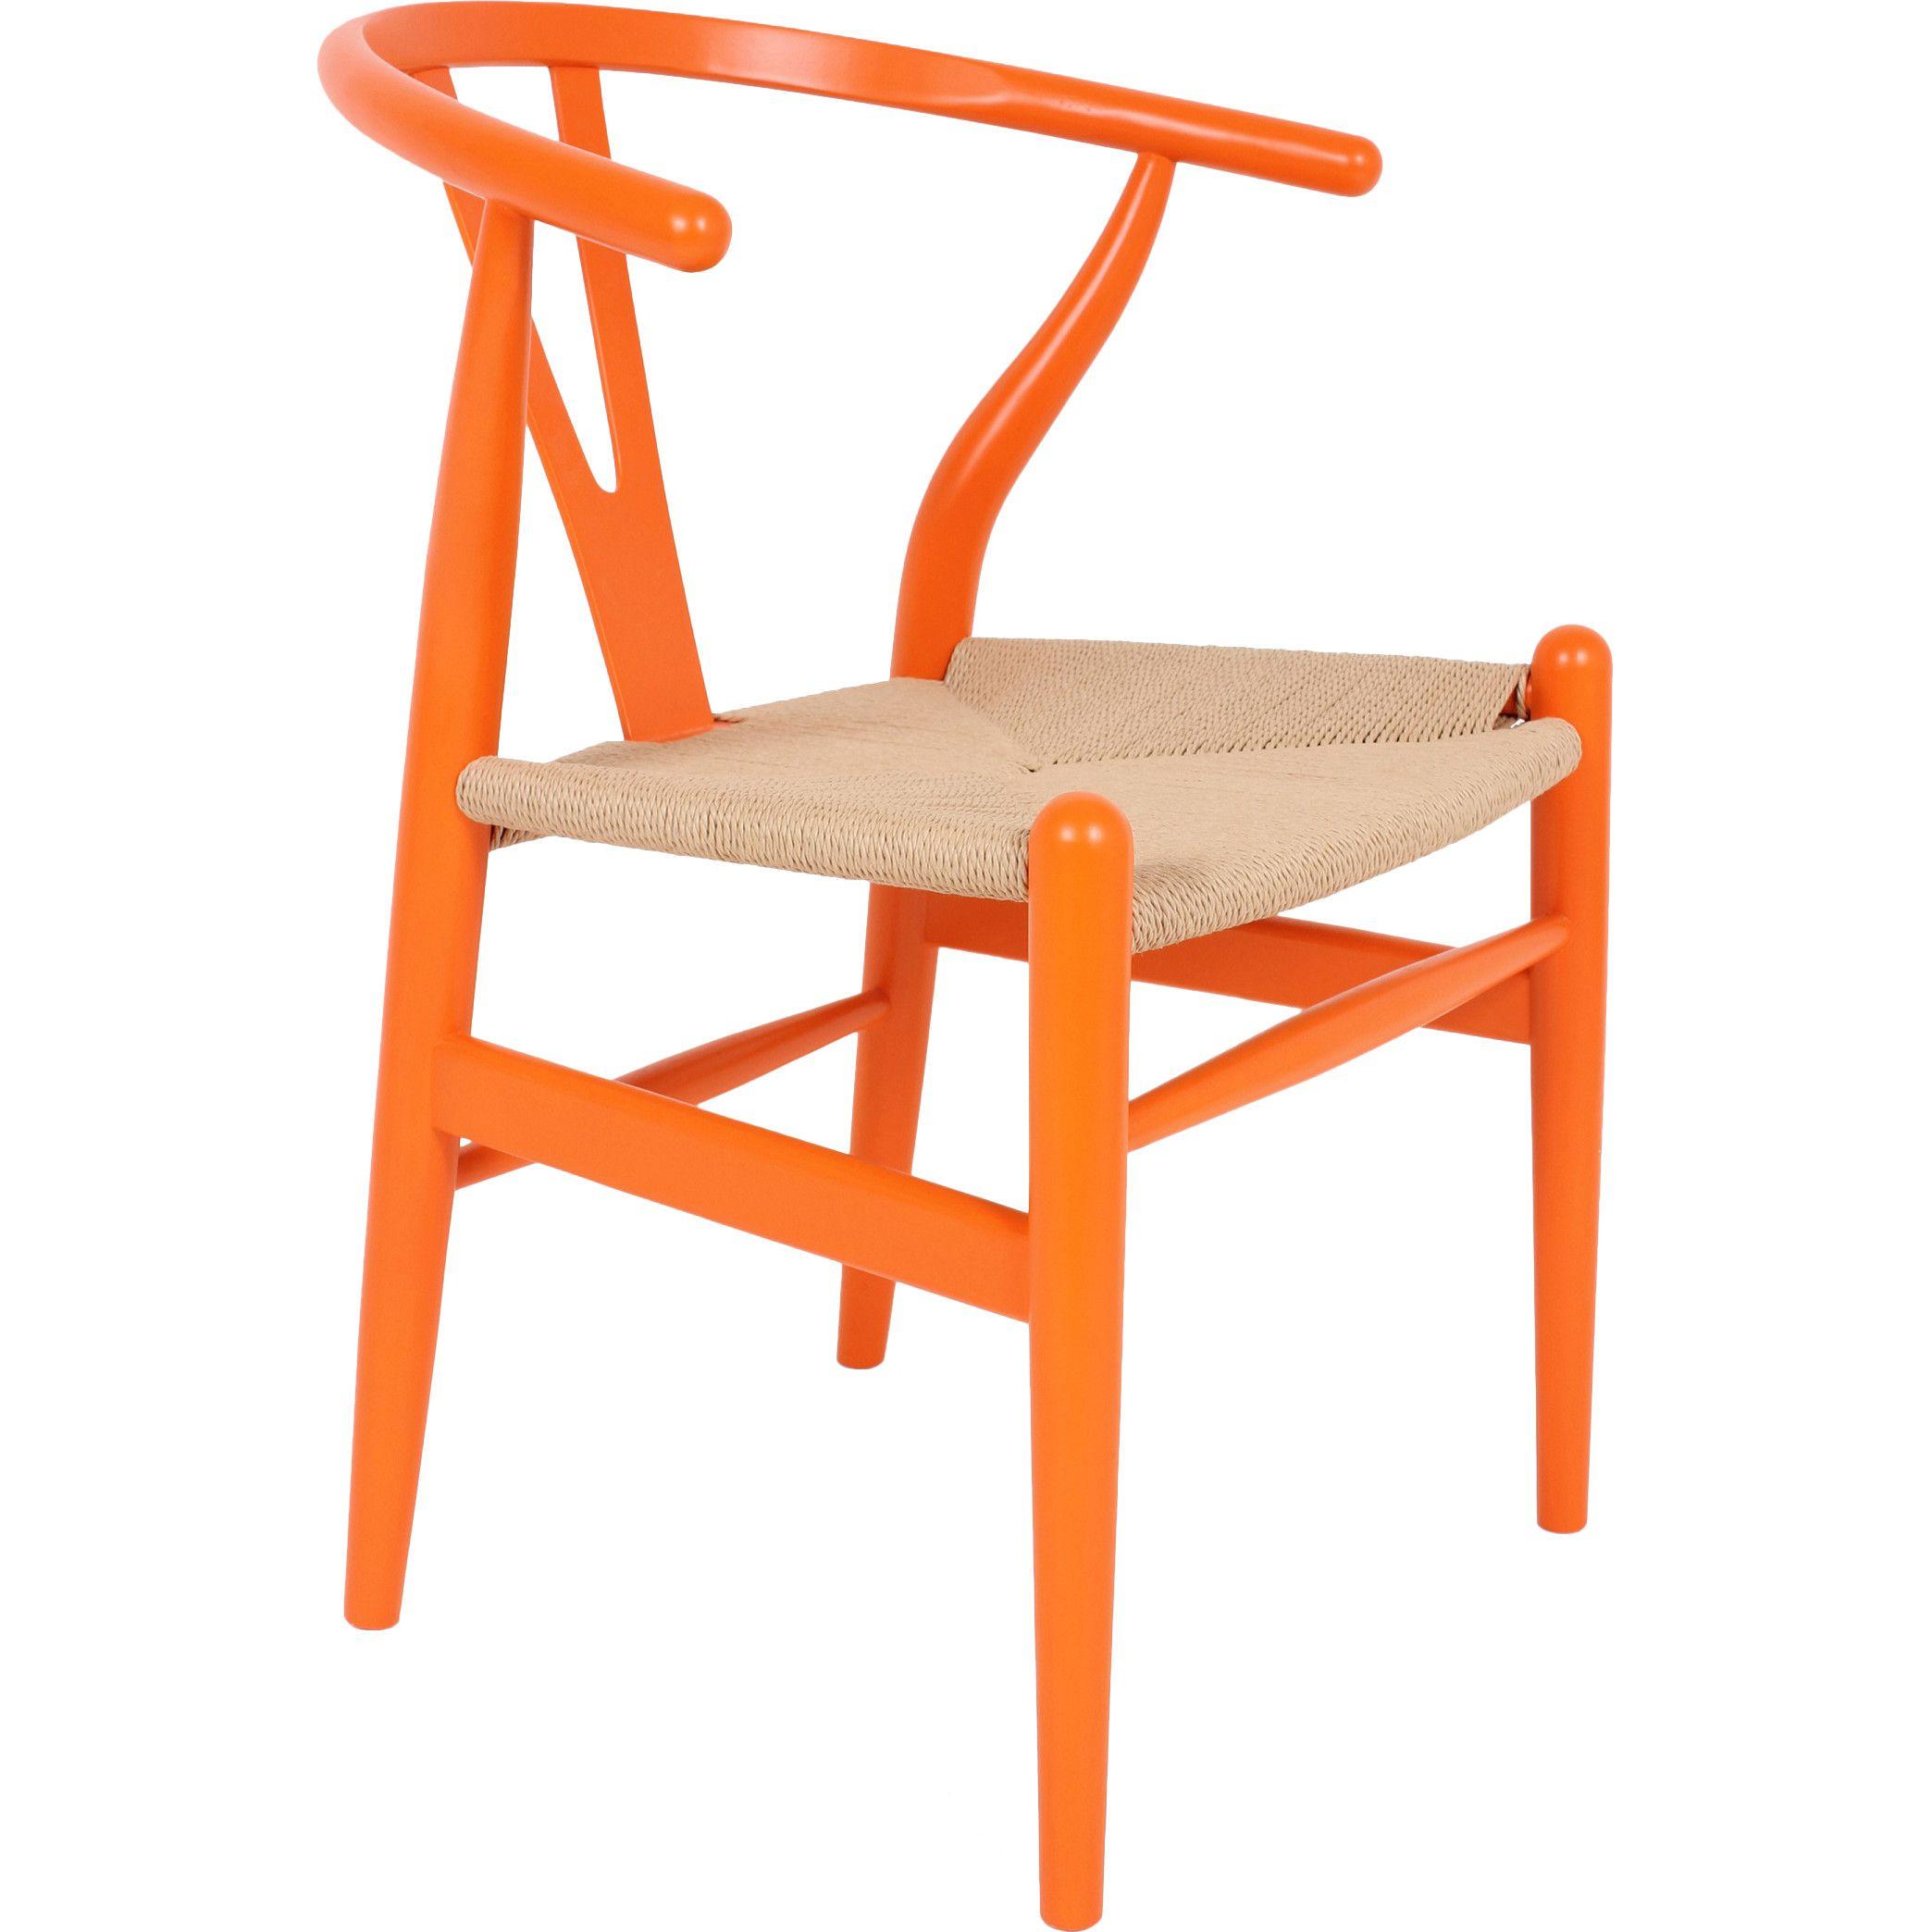 dcor design the wishbone arm chair. dcor design the wishbone arm chair  dressers  pinterest  office